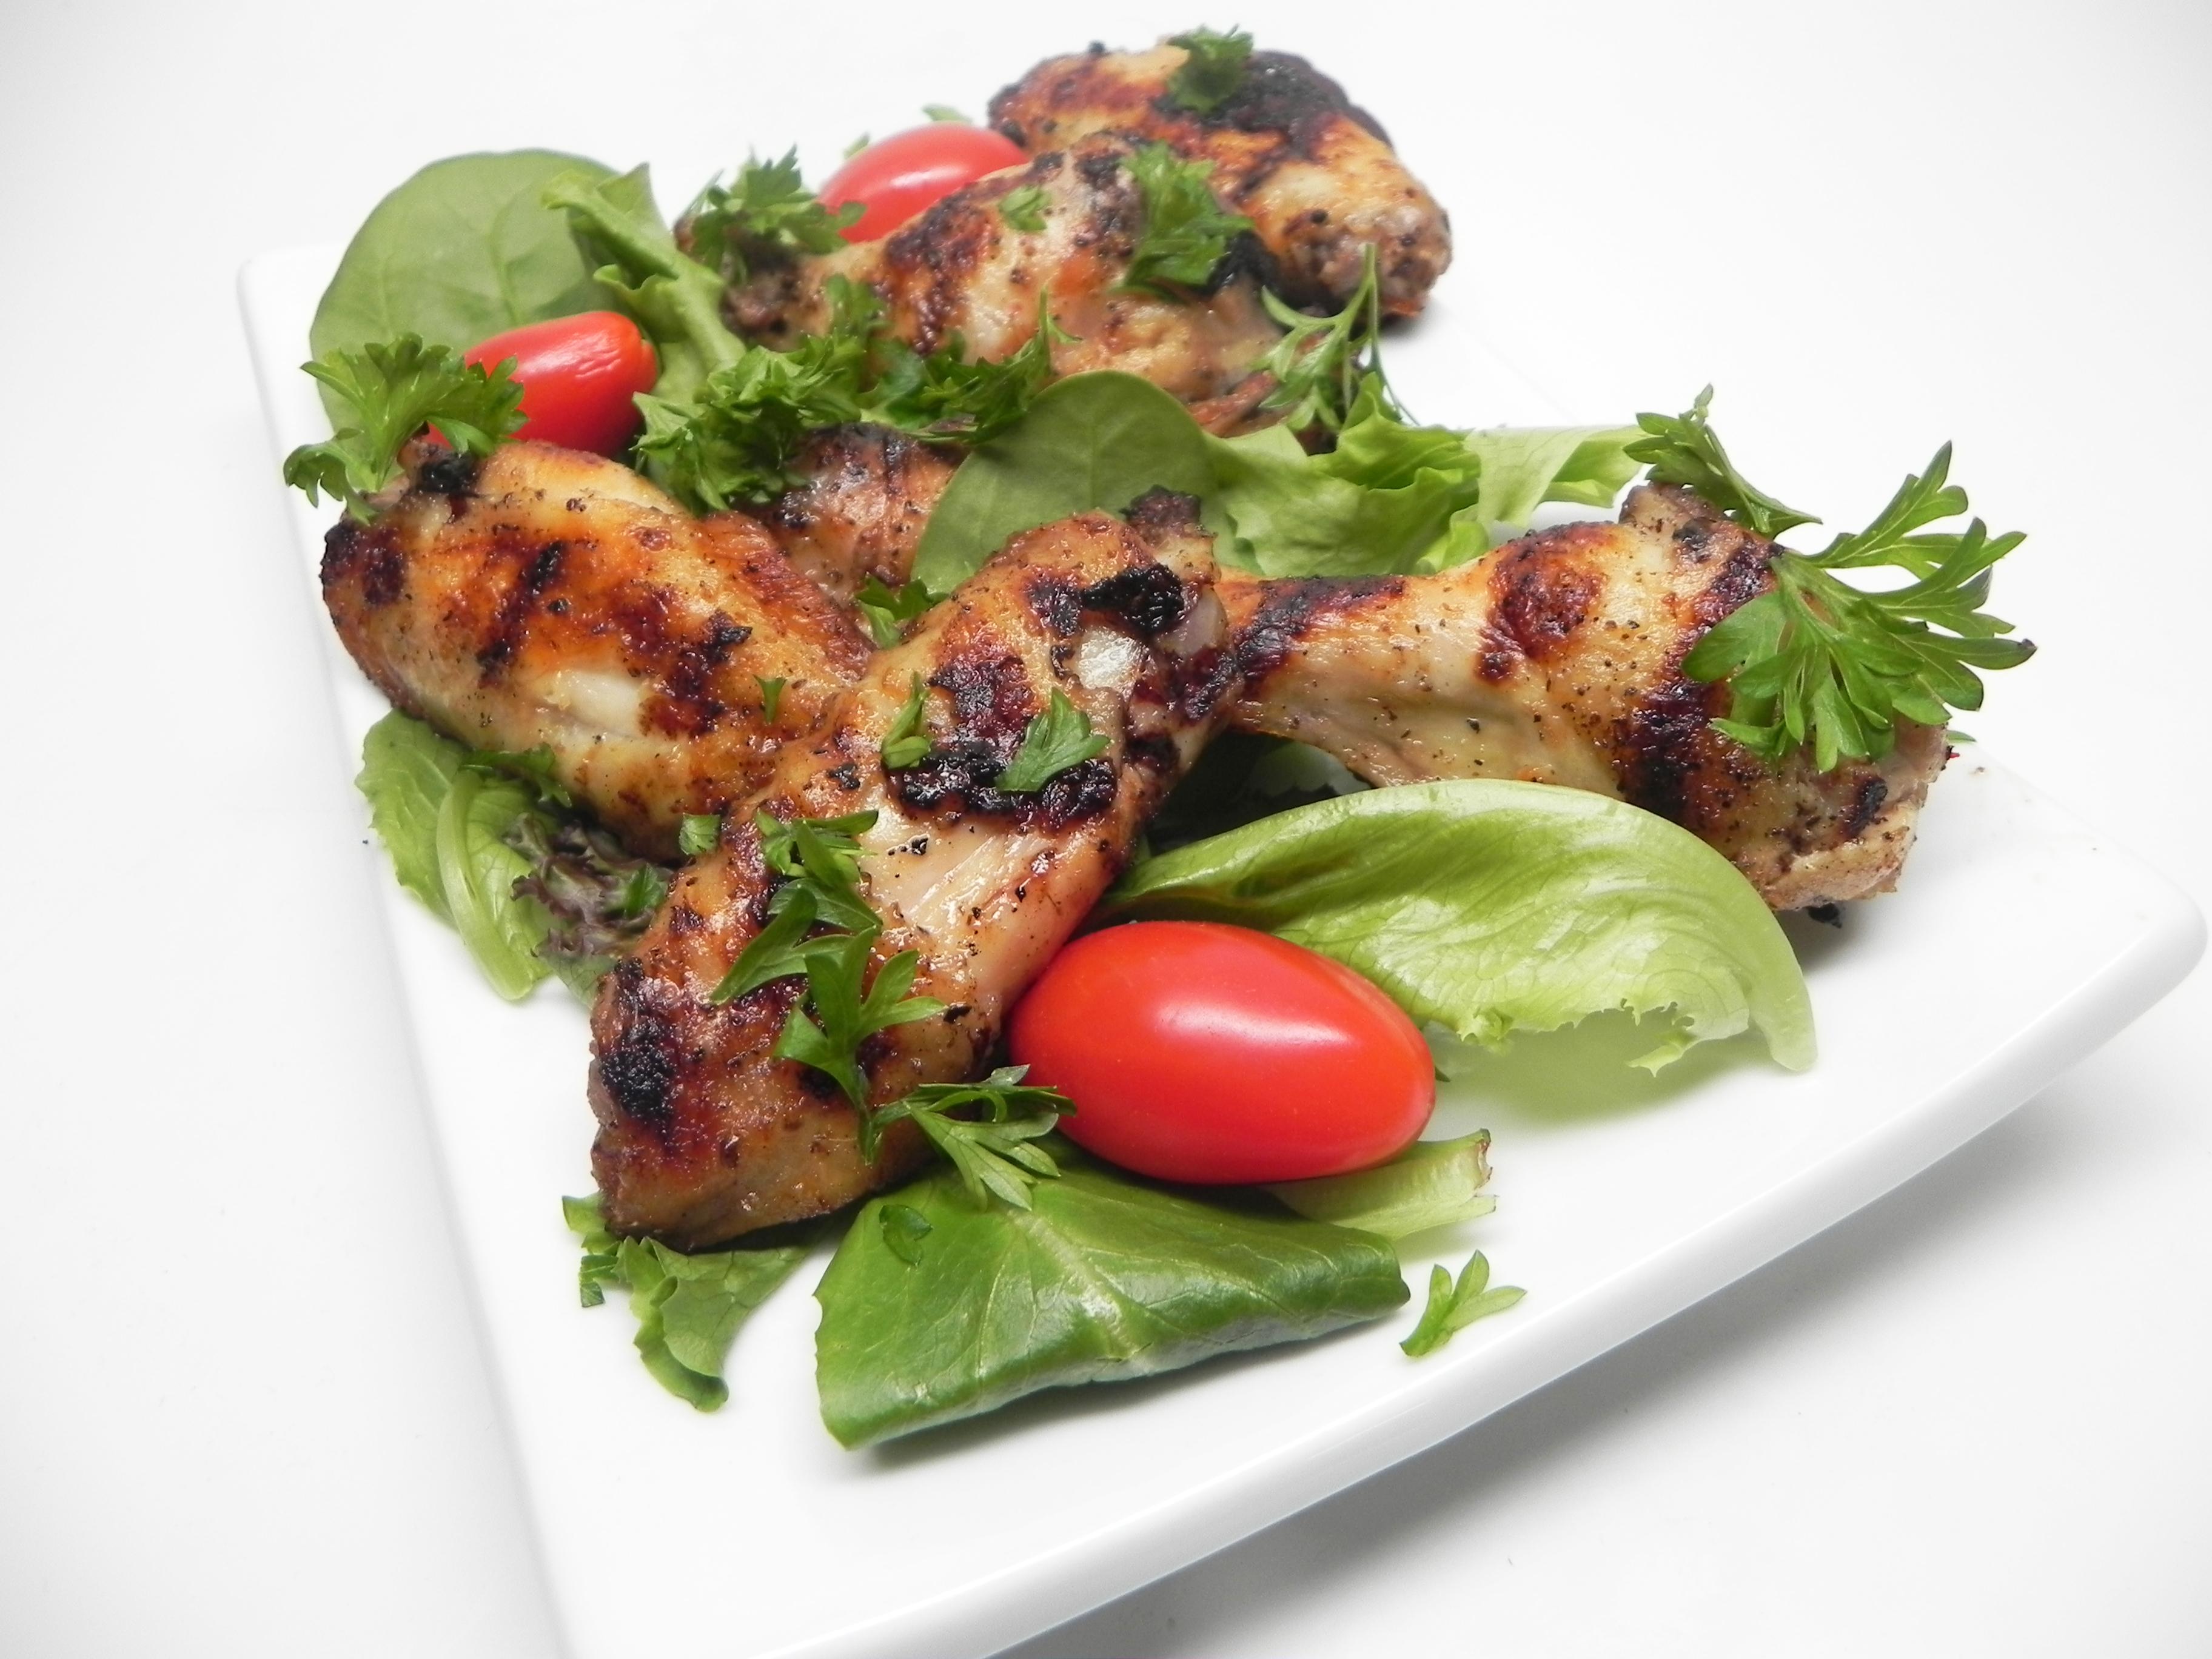 Lemon and Garlic Chicken Wings Brigitte